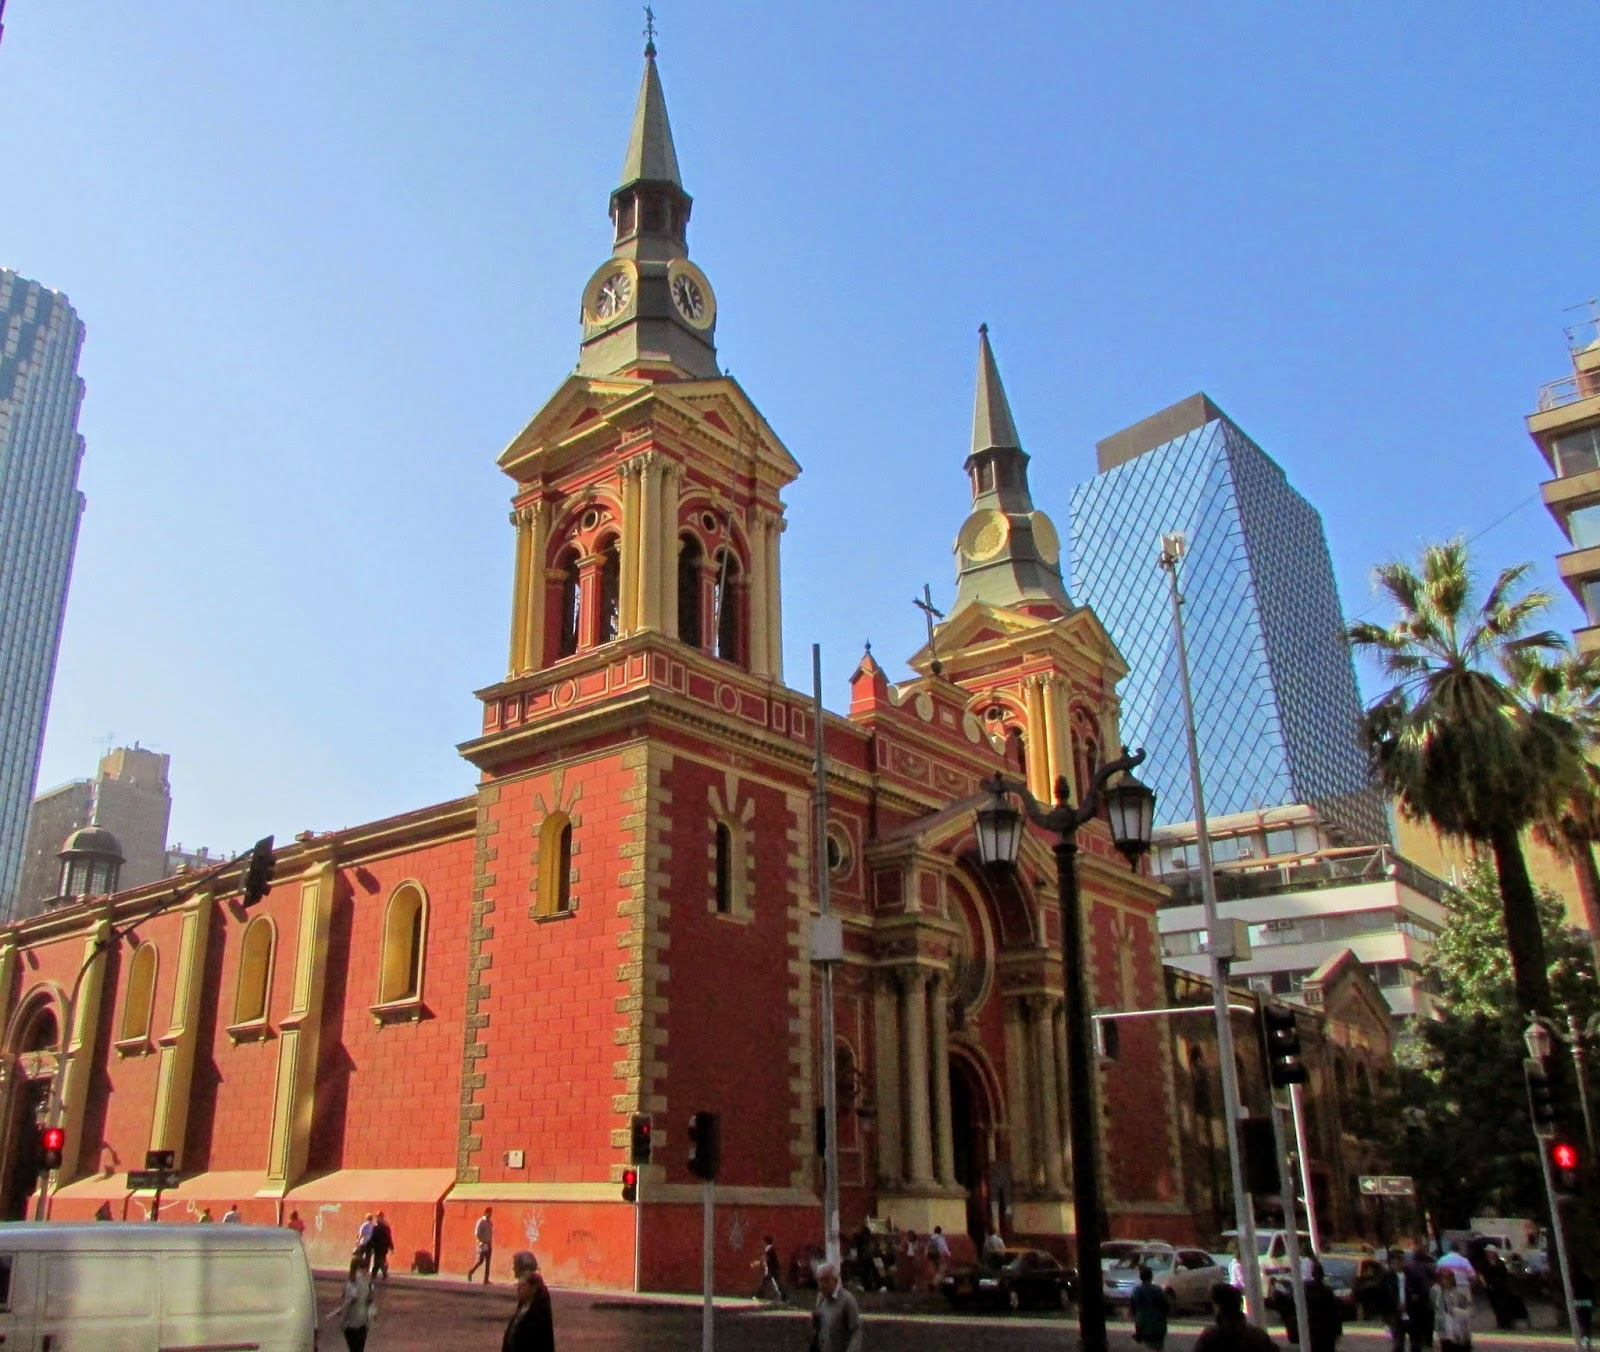 Basílica de la Merced - Construcciones Moguerza